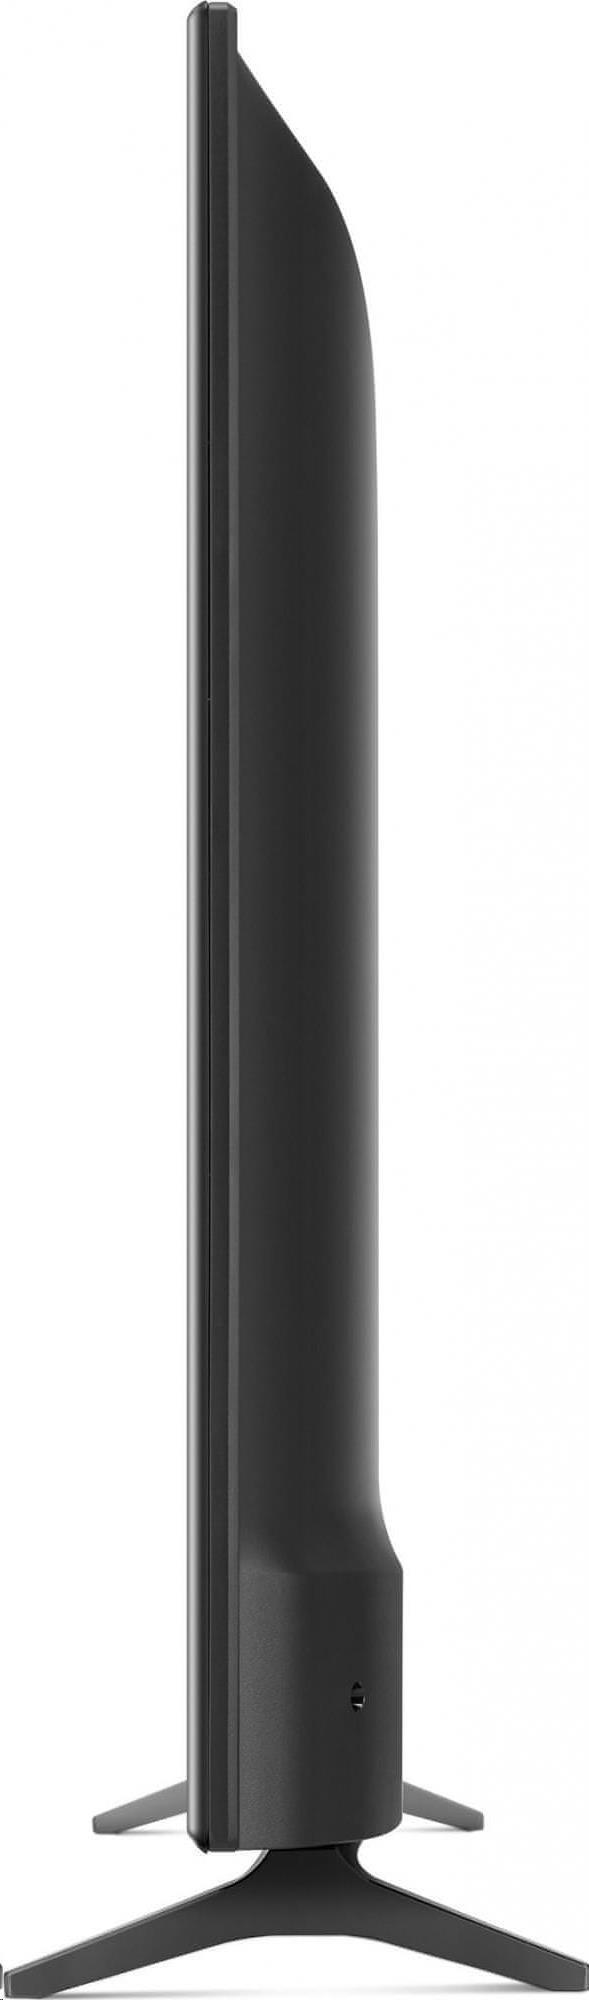 "LG 49UK6200PLA Smart LED TV; 49""; 3840x2160; WebOS; Wi-Fi; HBB - TV; PVR ready; Bluetooth; VESA; HDMI; USB; LAN; DVB-T2/"